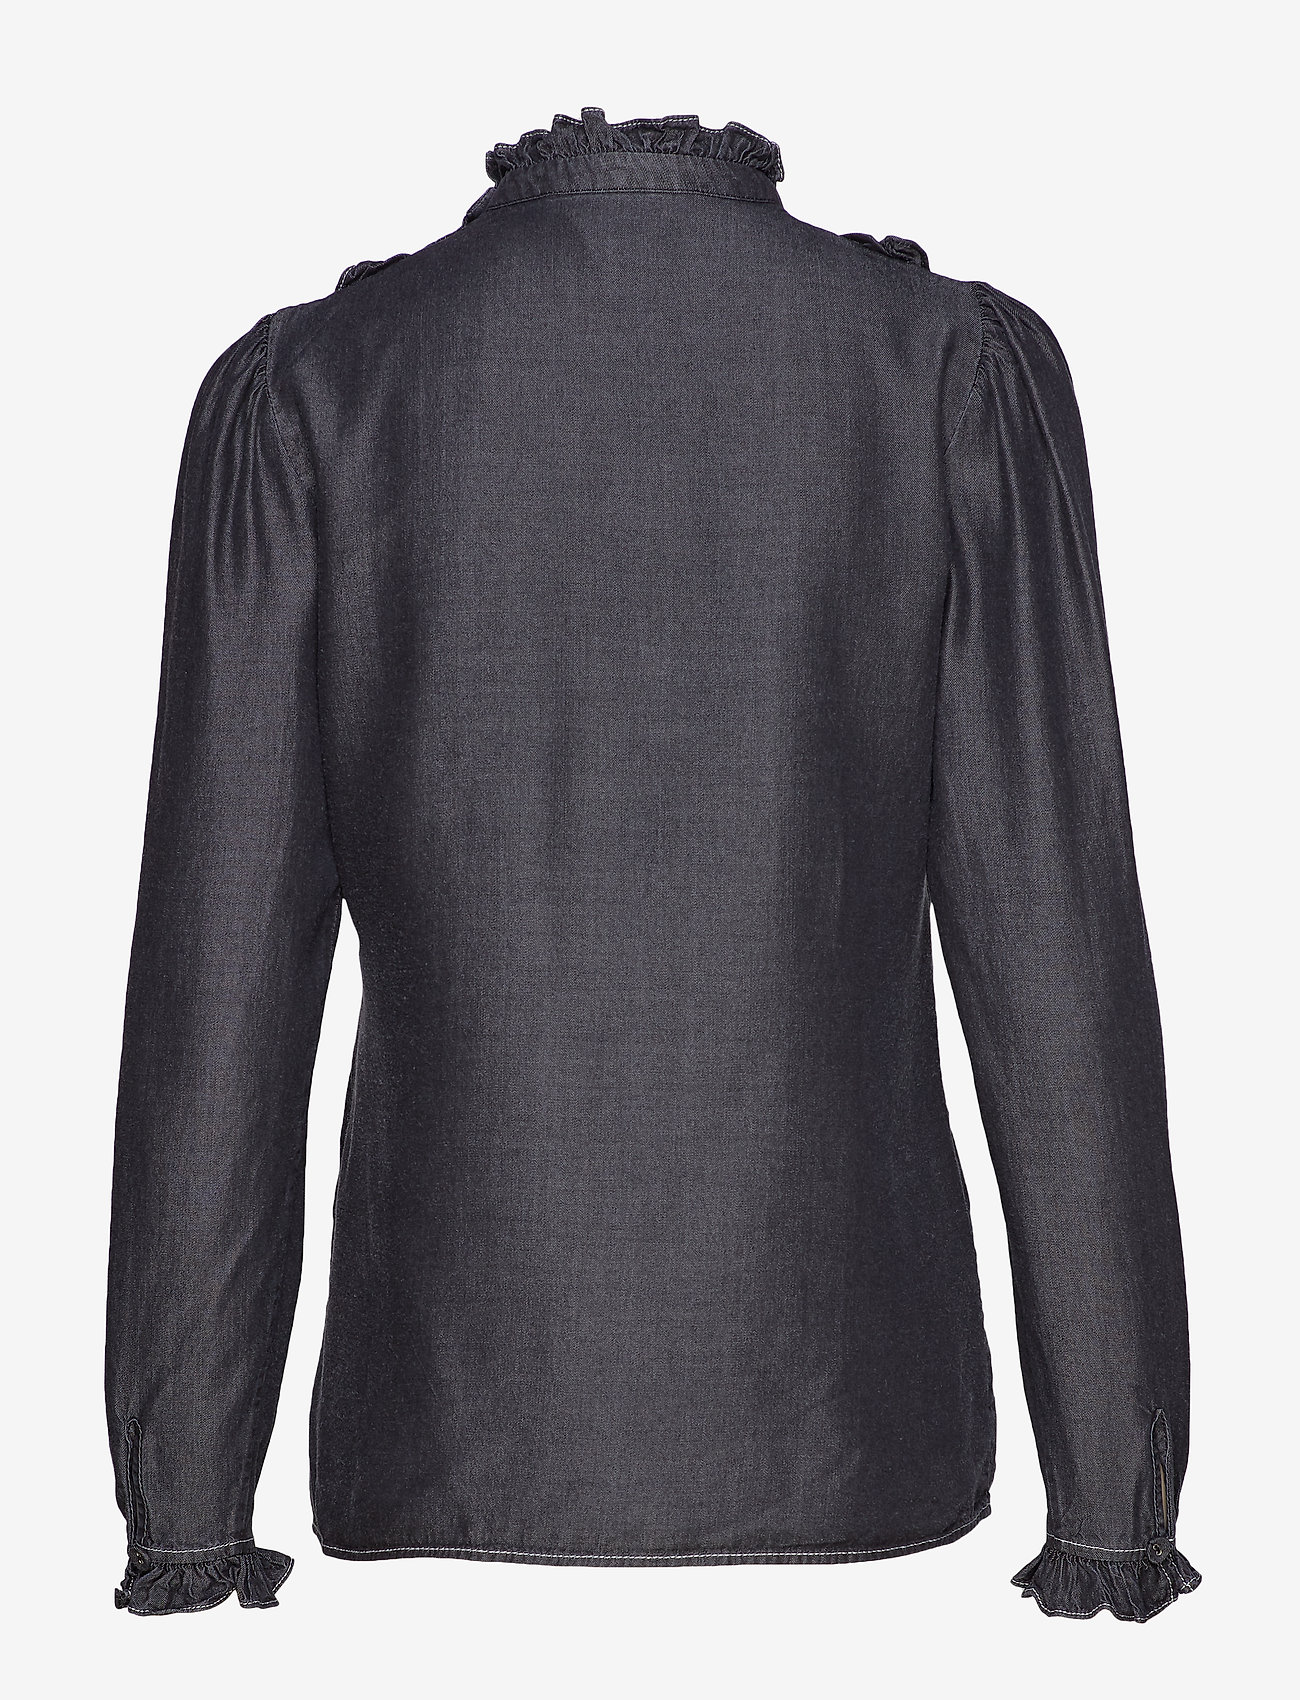 Polly Shirt (Black Denim) (612 kr) - DESIGNERS, REMIX